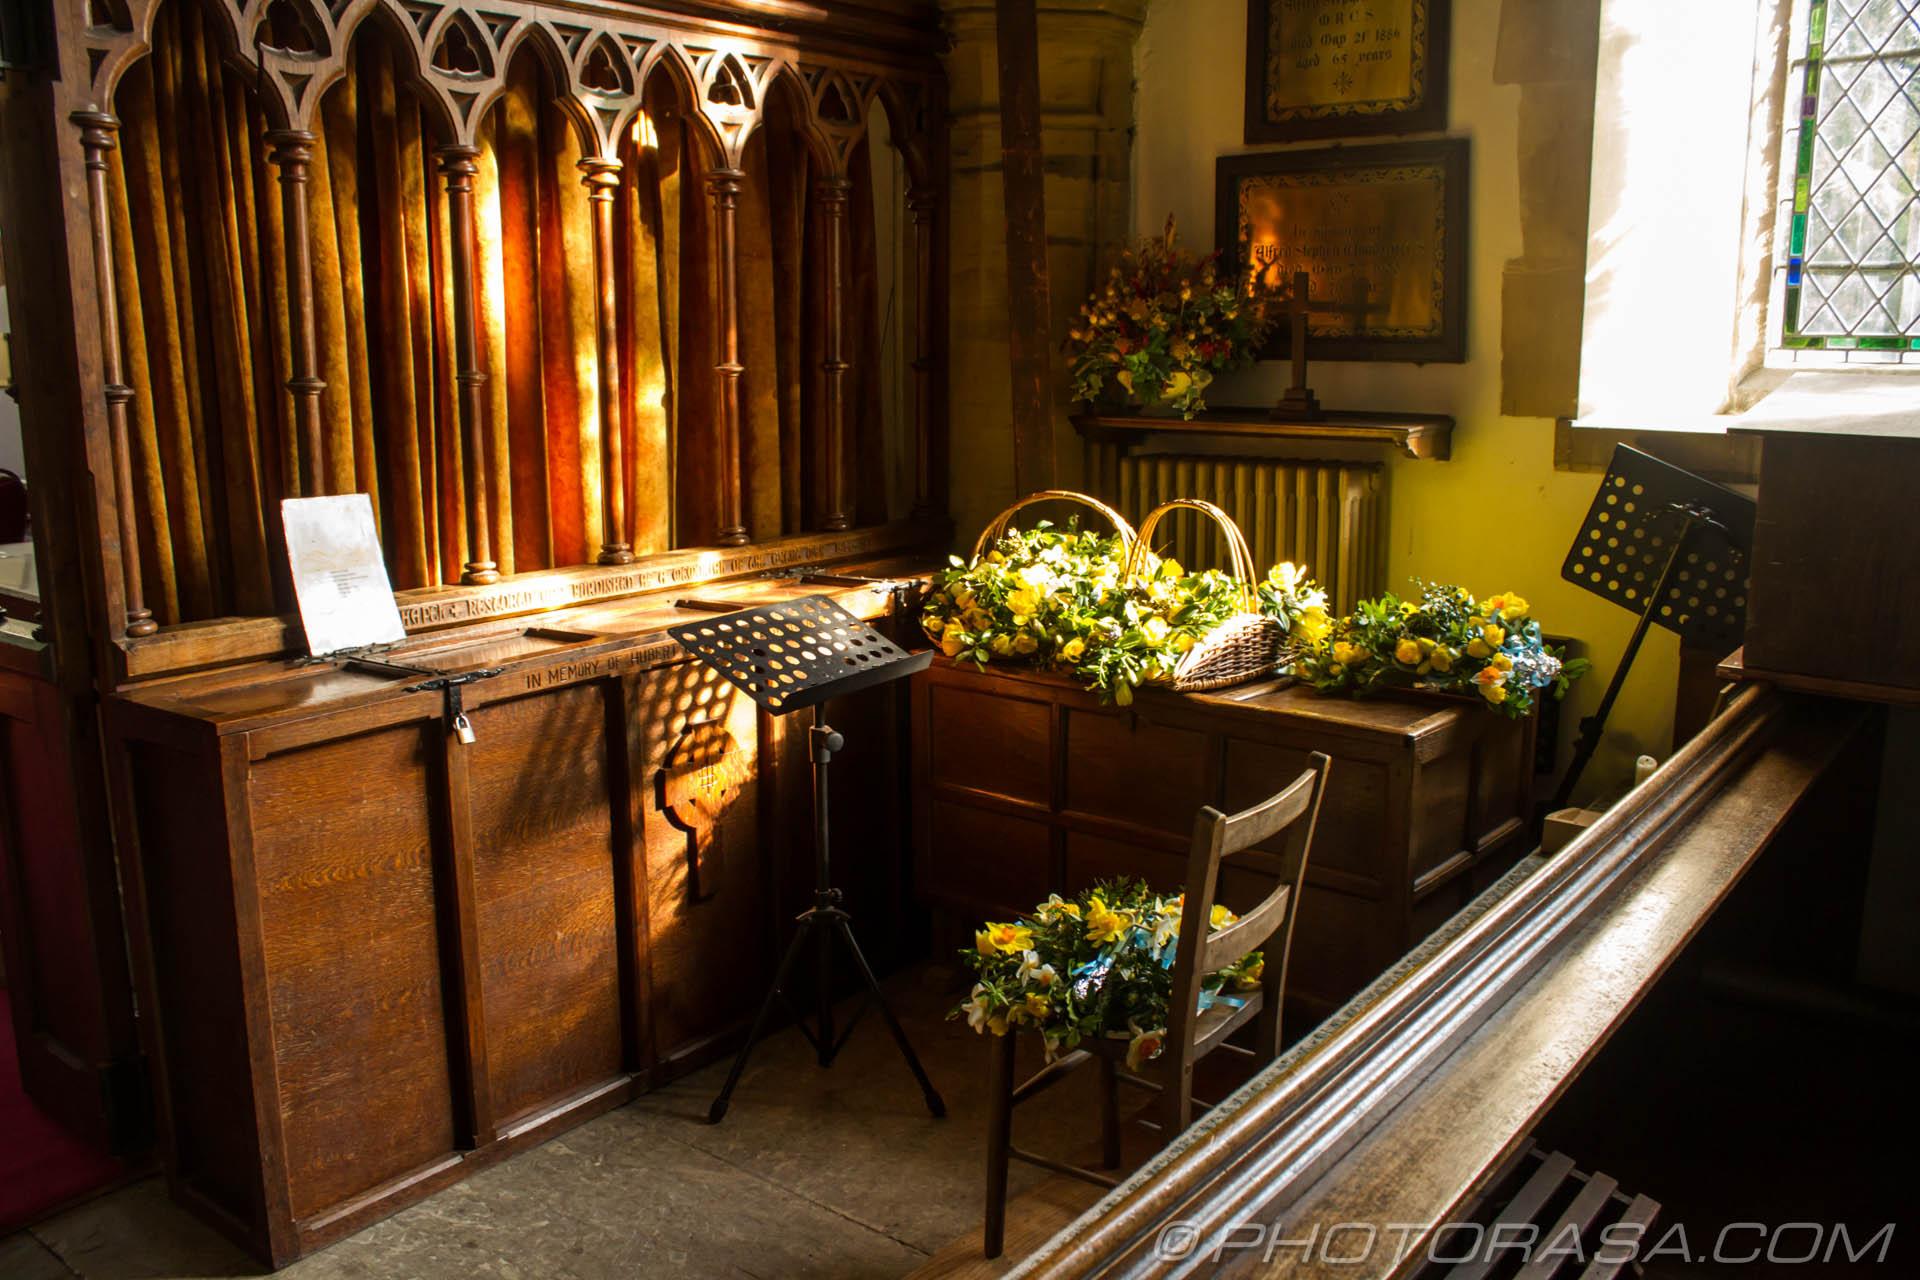 https://photorasa.com/saints-church-staplehurst-kent/flowers/